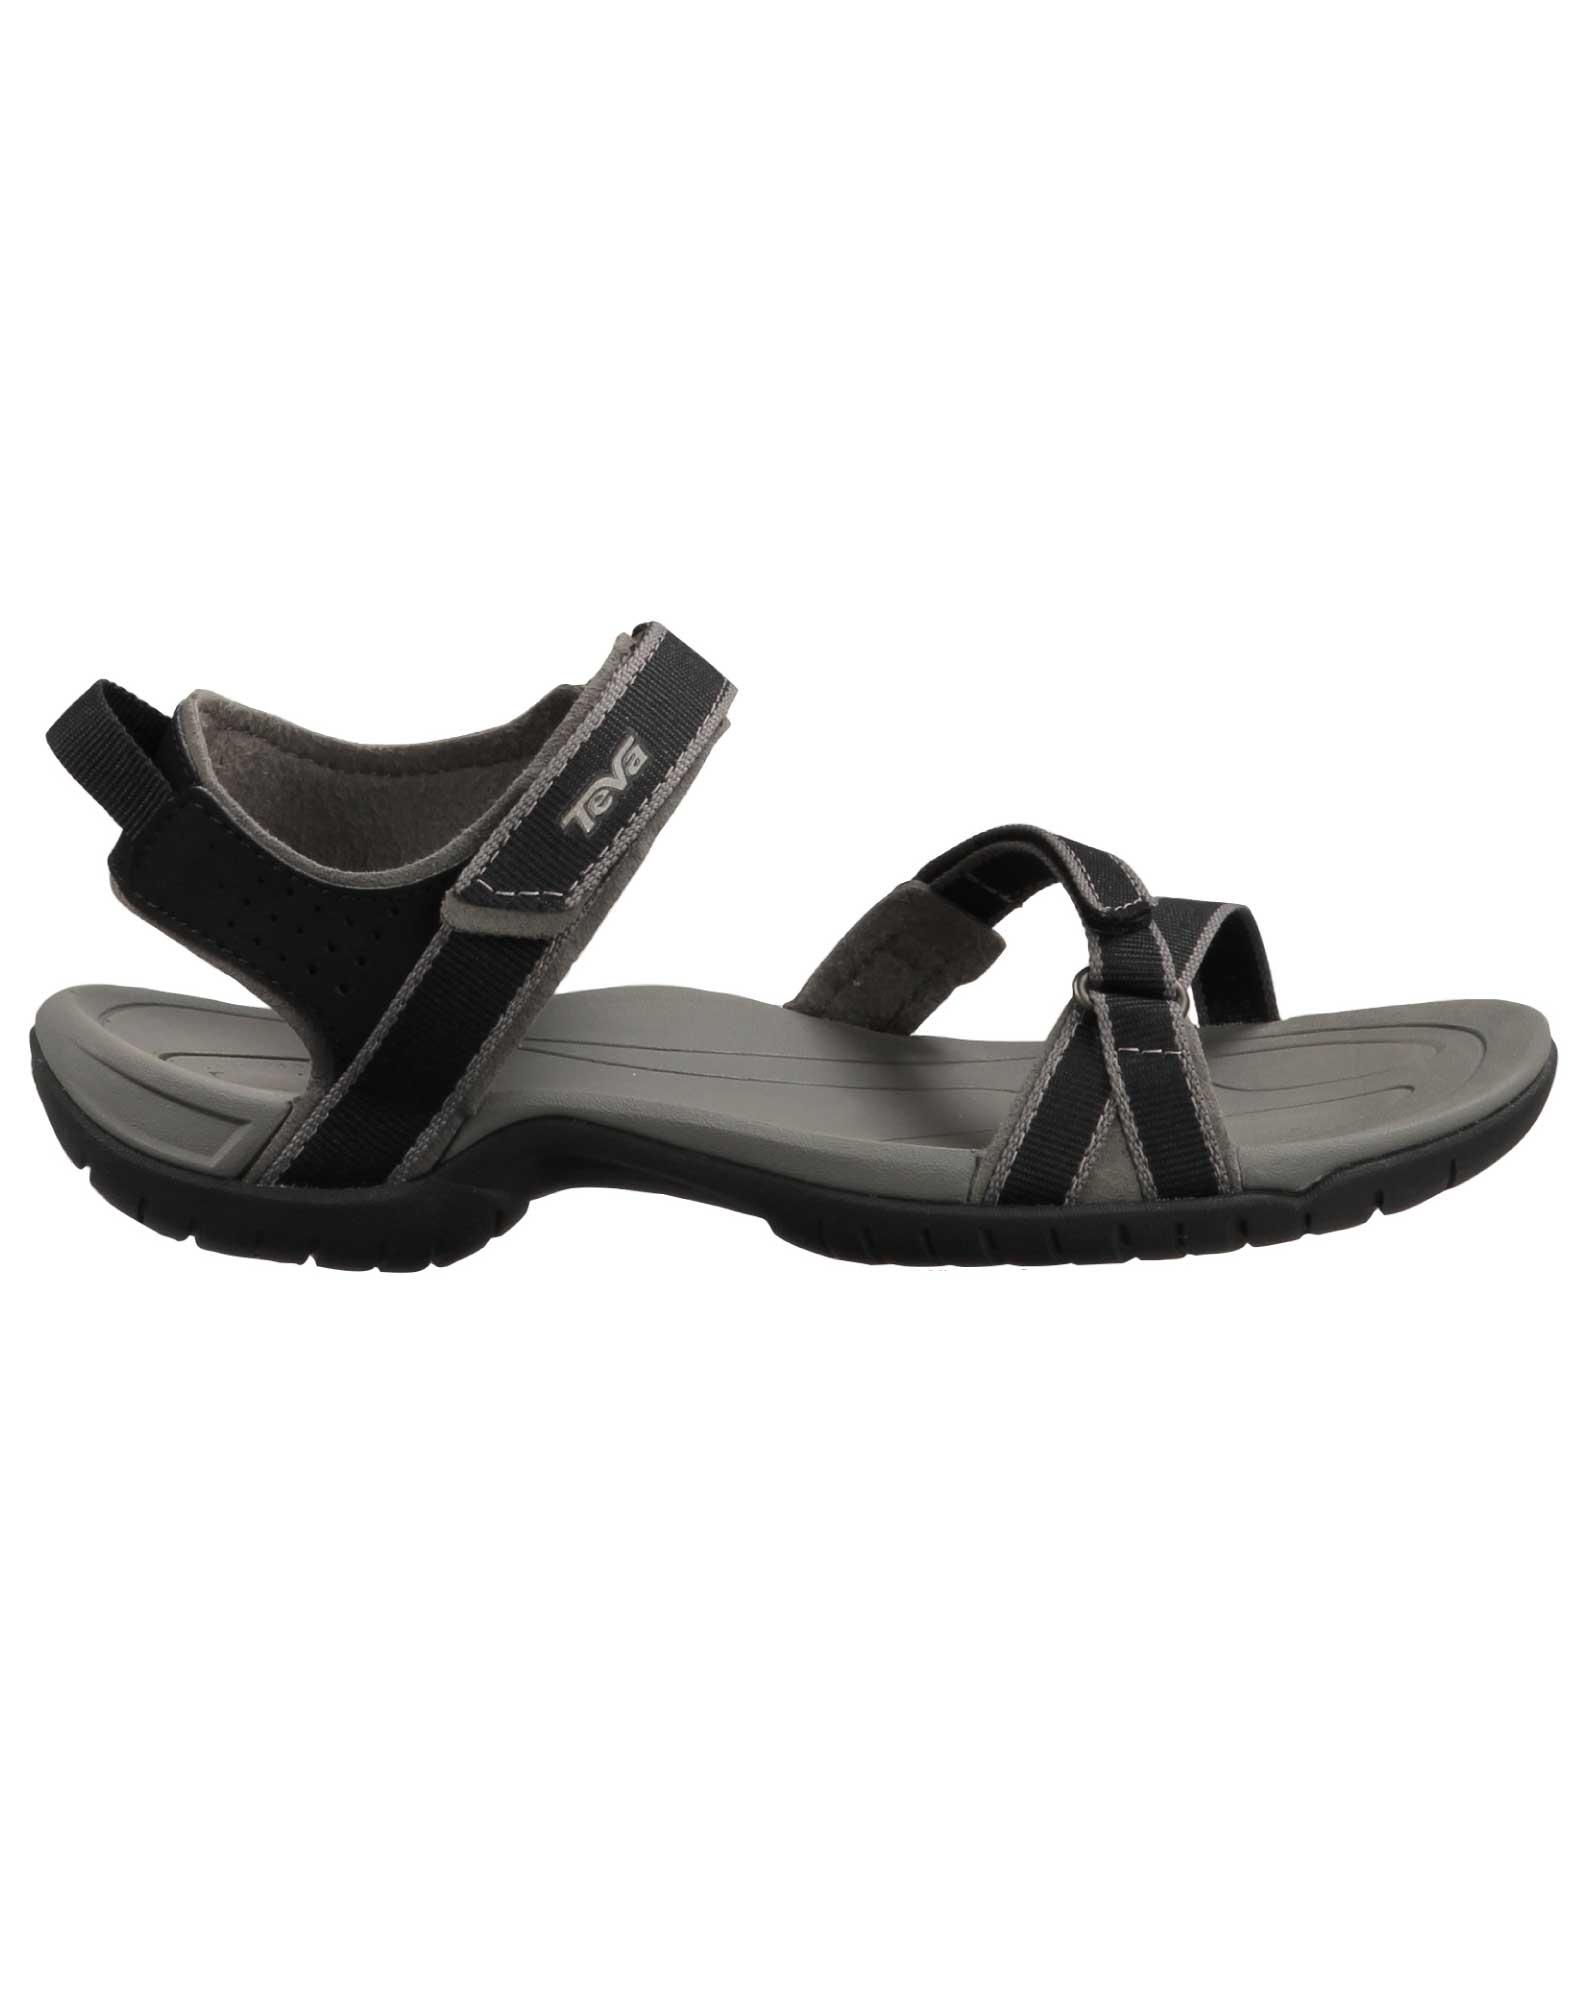 f9e693f66a7f Køb Teva Verra sandal sort-grå dame